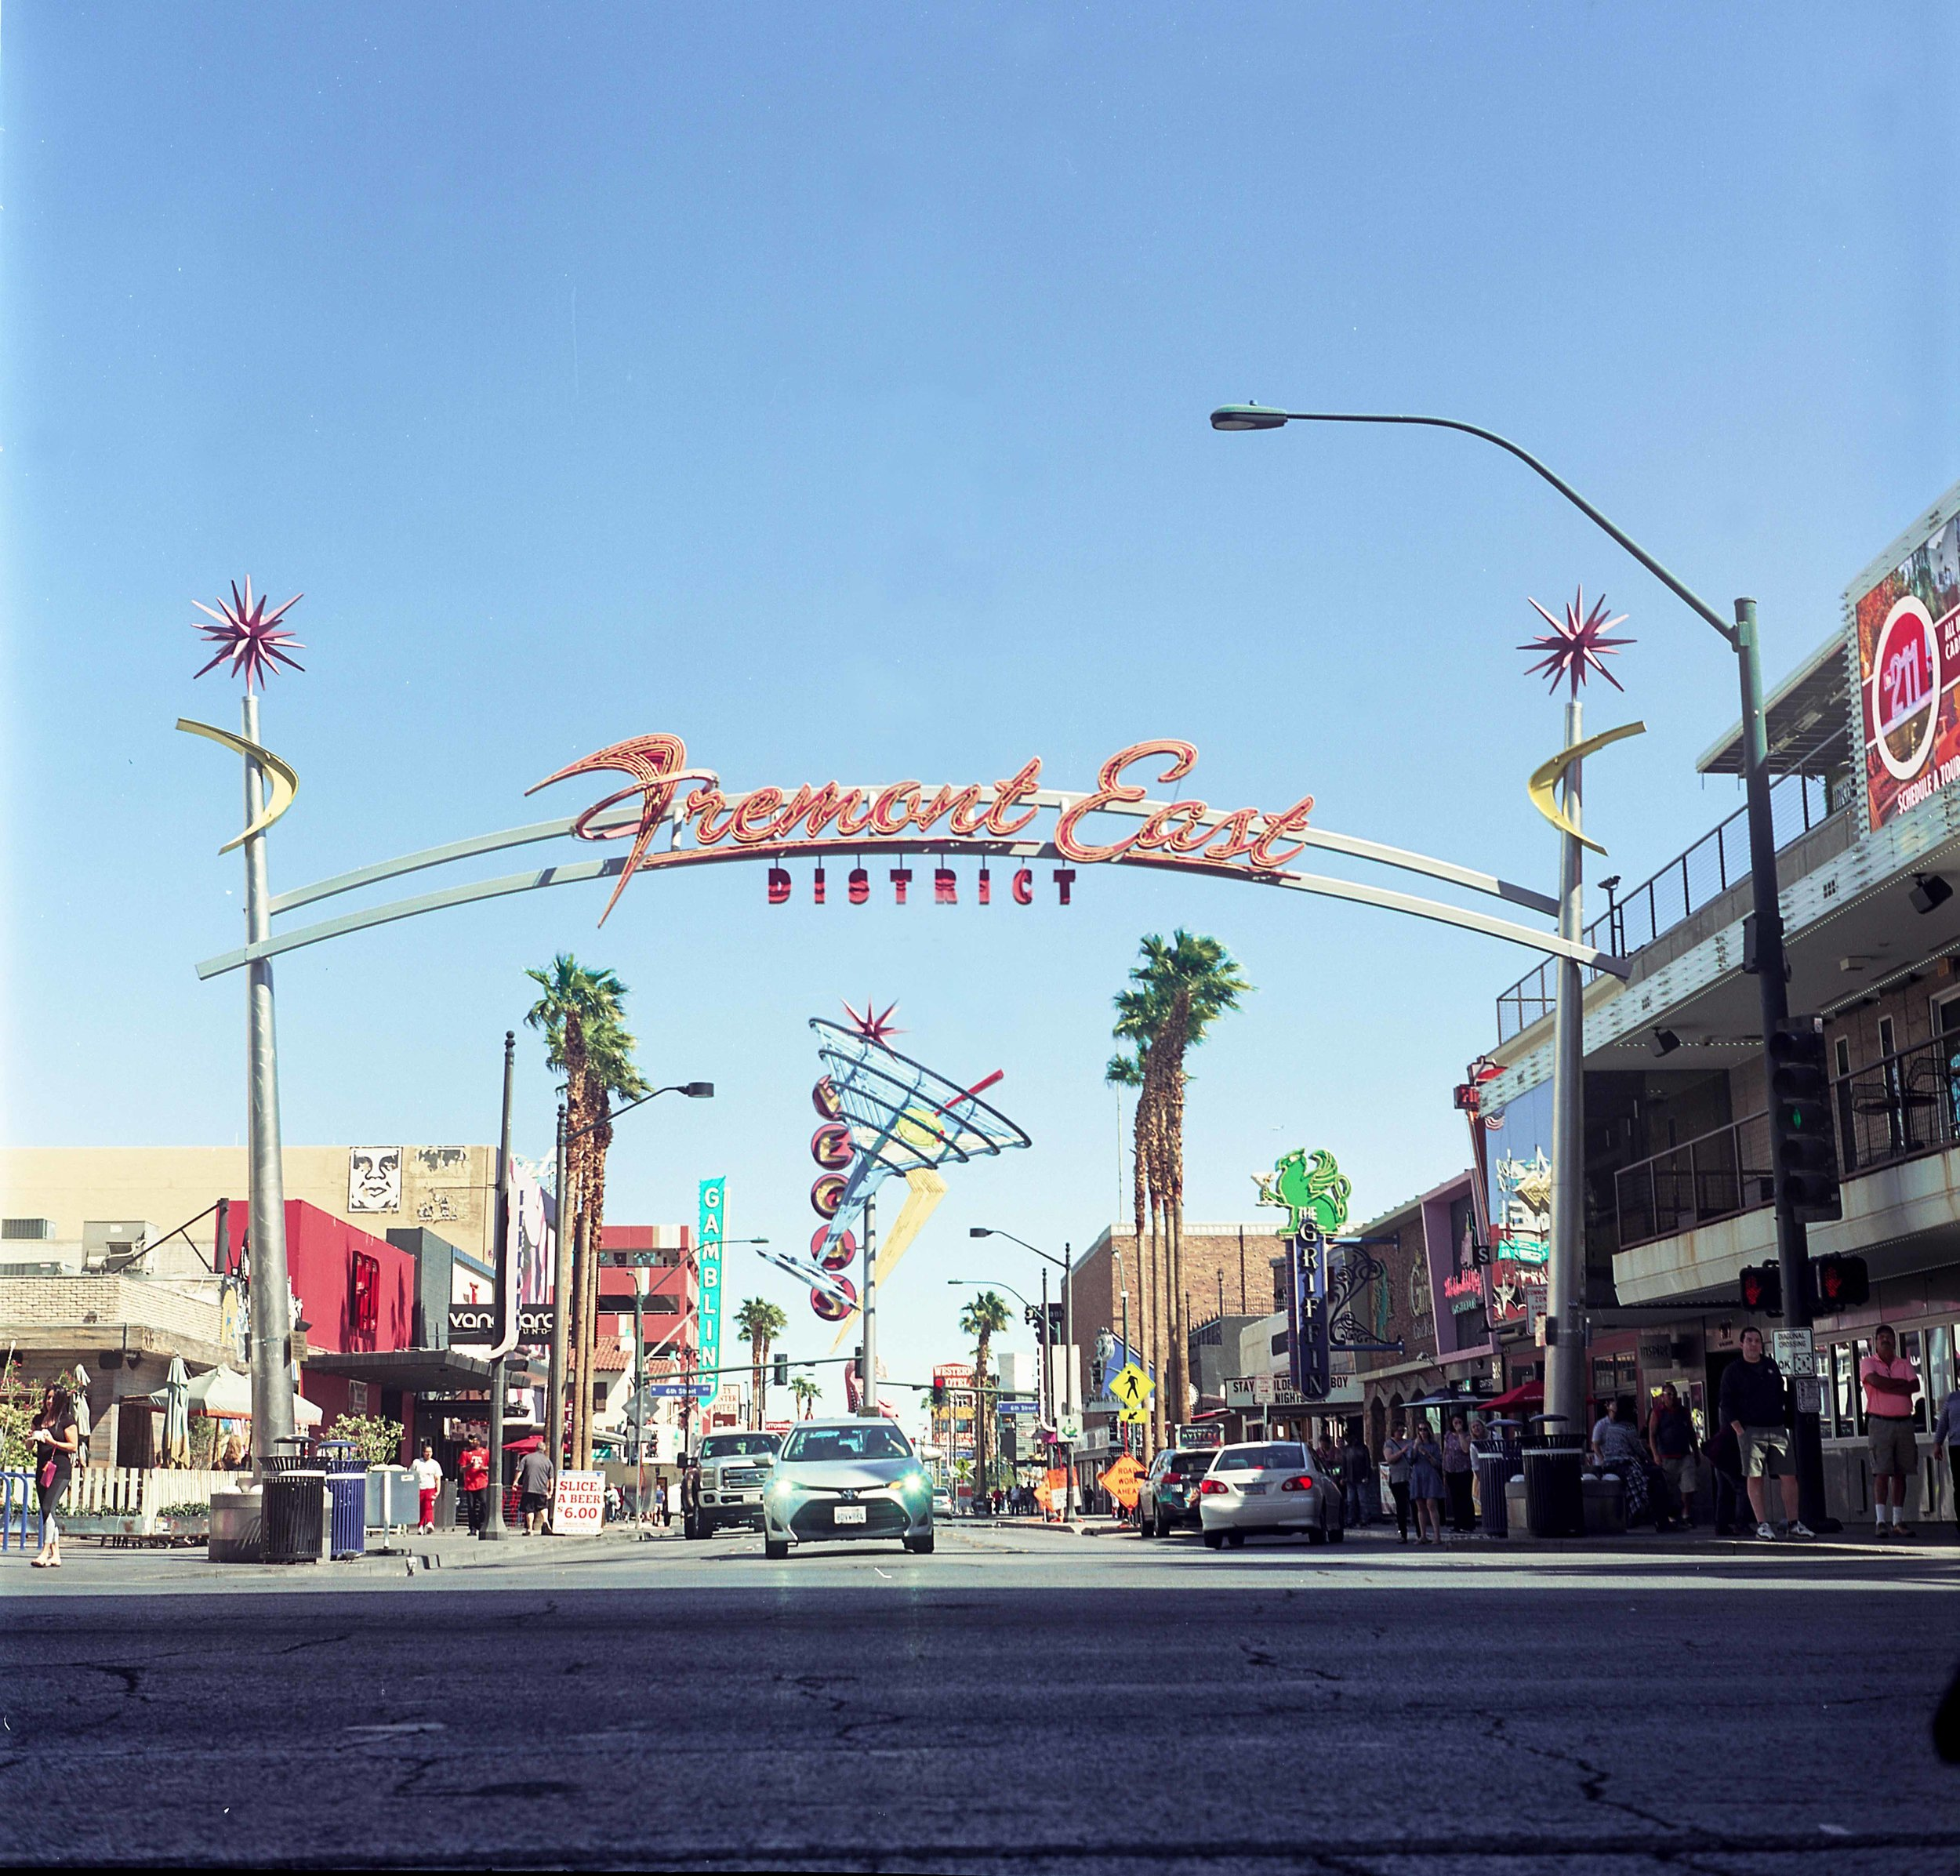 The entrance to Vegas' Fremont Street District! Shot on Kodak Ektrar 100